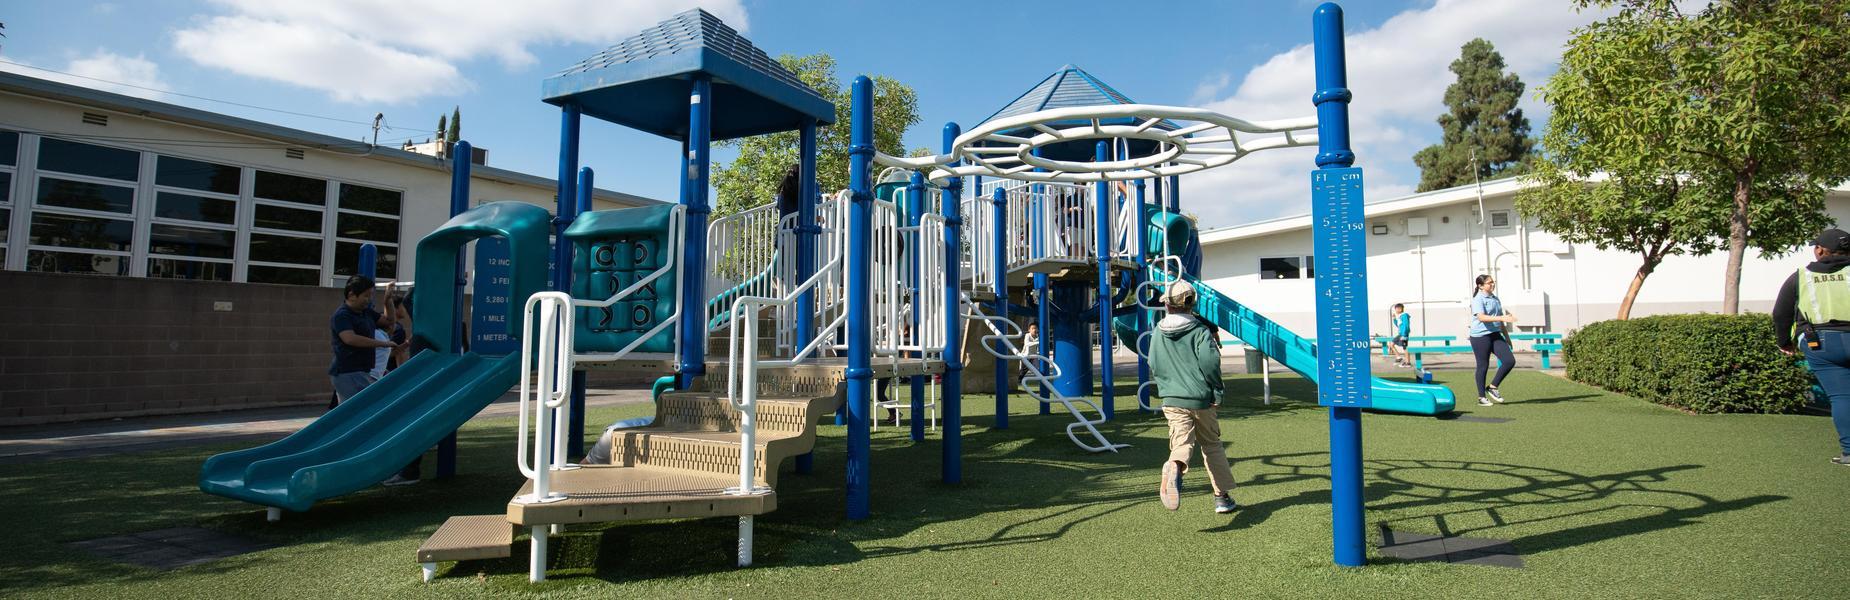 Ynez Playground during recess